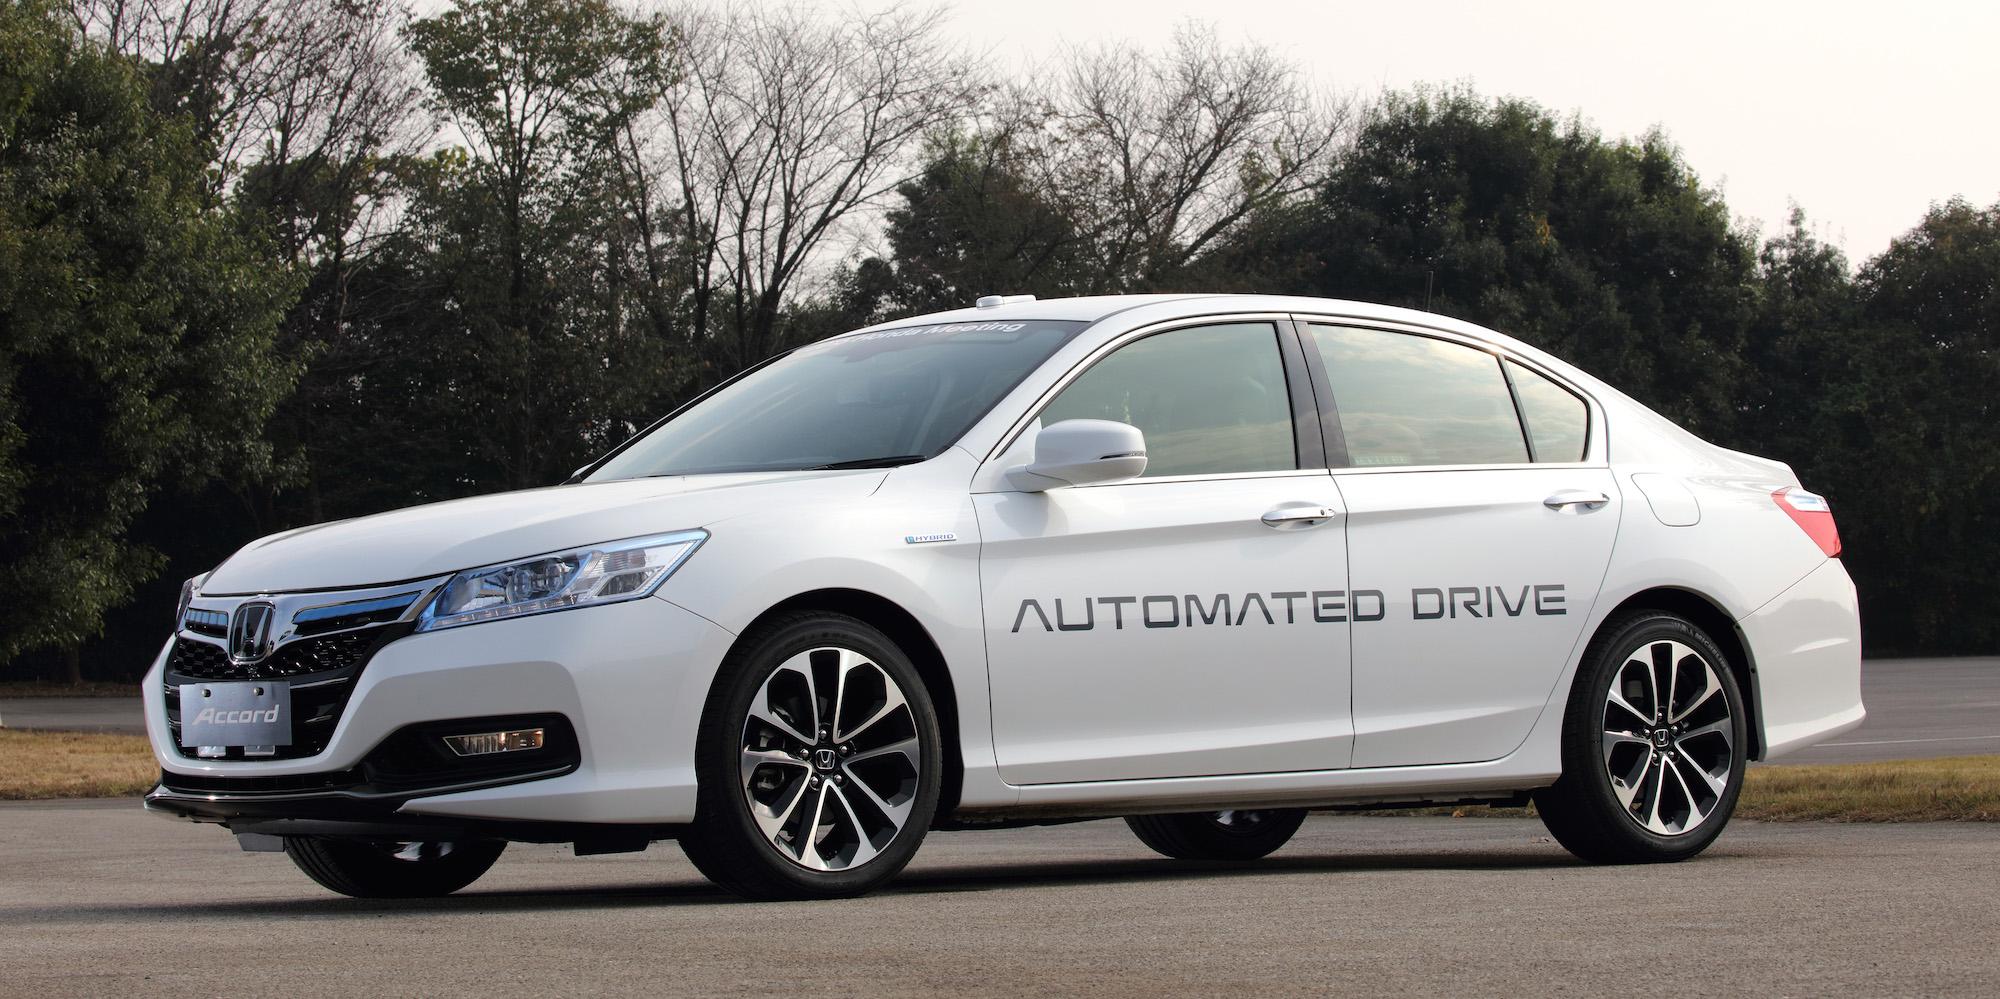 honda-accord-automated-drive